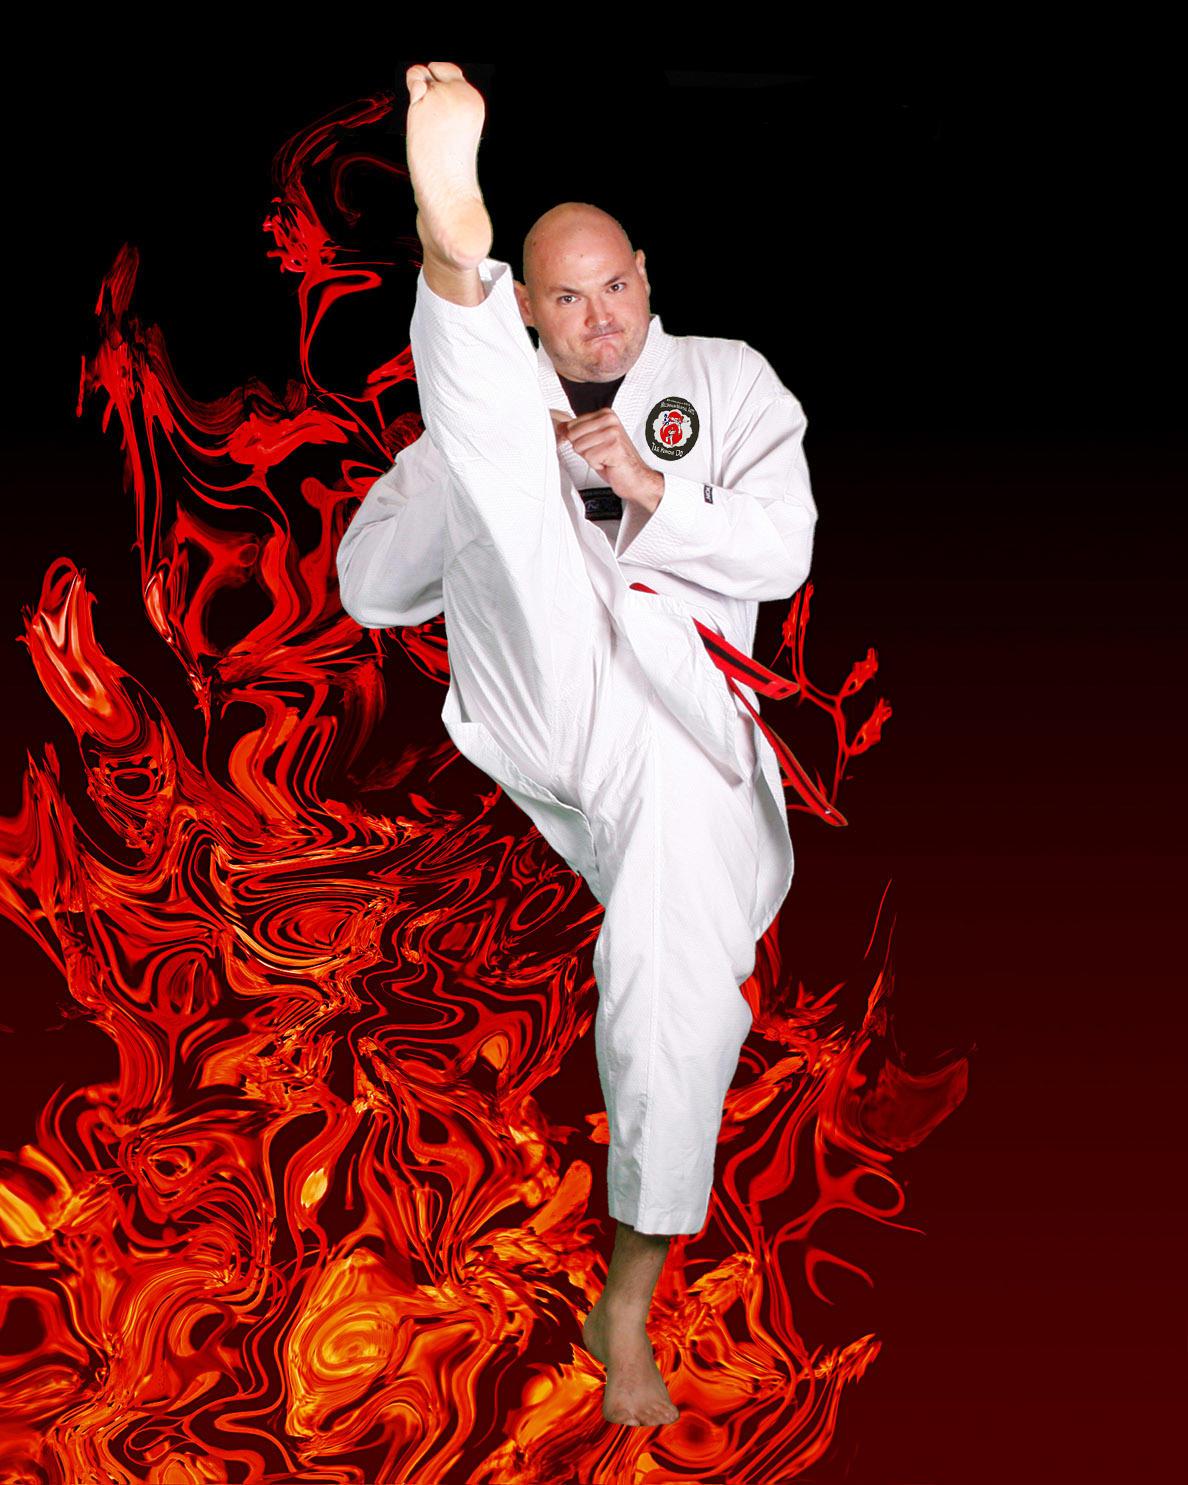 Millennium Martial Arts - Tae Kwon Do image 9